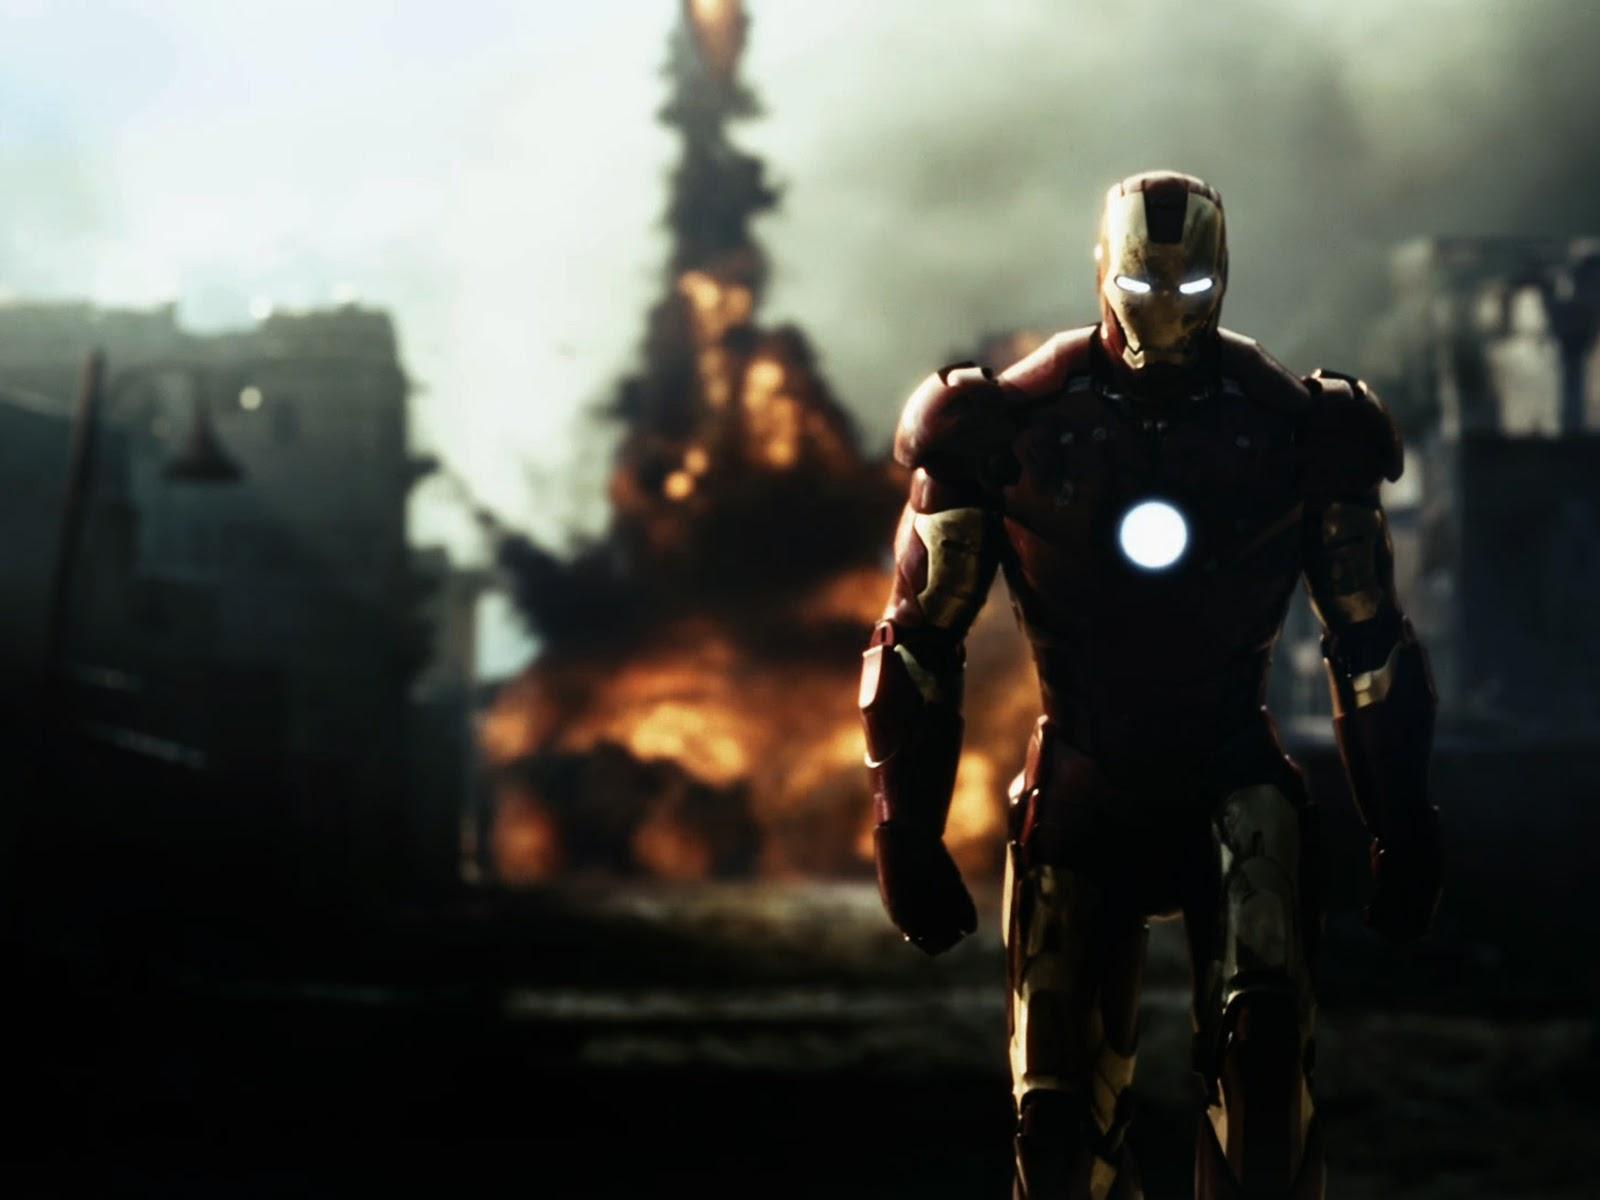 http://3.bp.blogspot.com/-HytGj6VNK-Q/ULWWAb-bNaI/AAAAAAAANfw/n8sKcQphivA/s1600/HD_Iron_Man_Wallpaper_1%2520copy.bmp